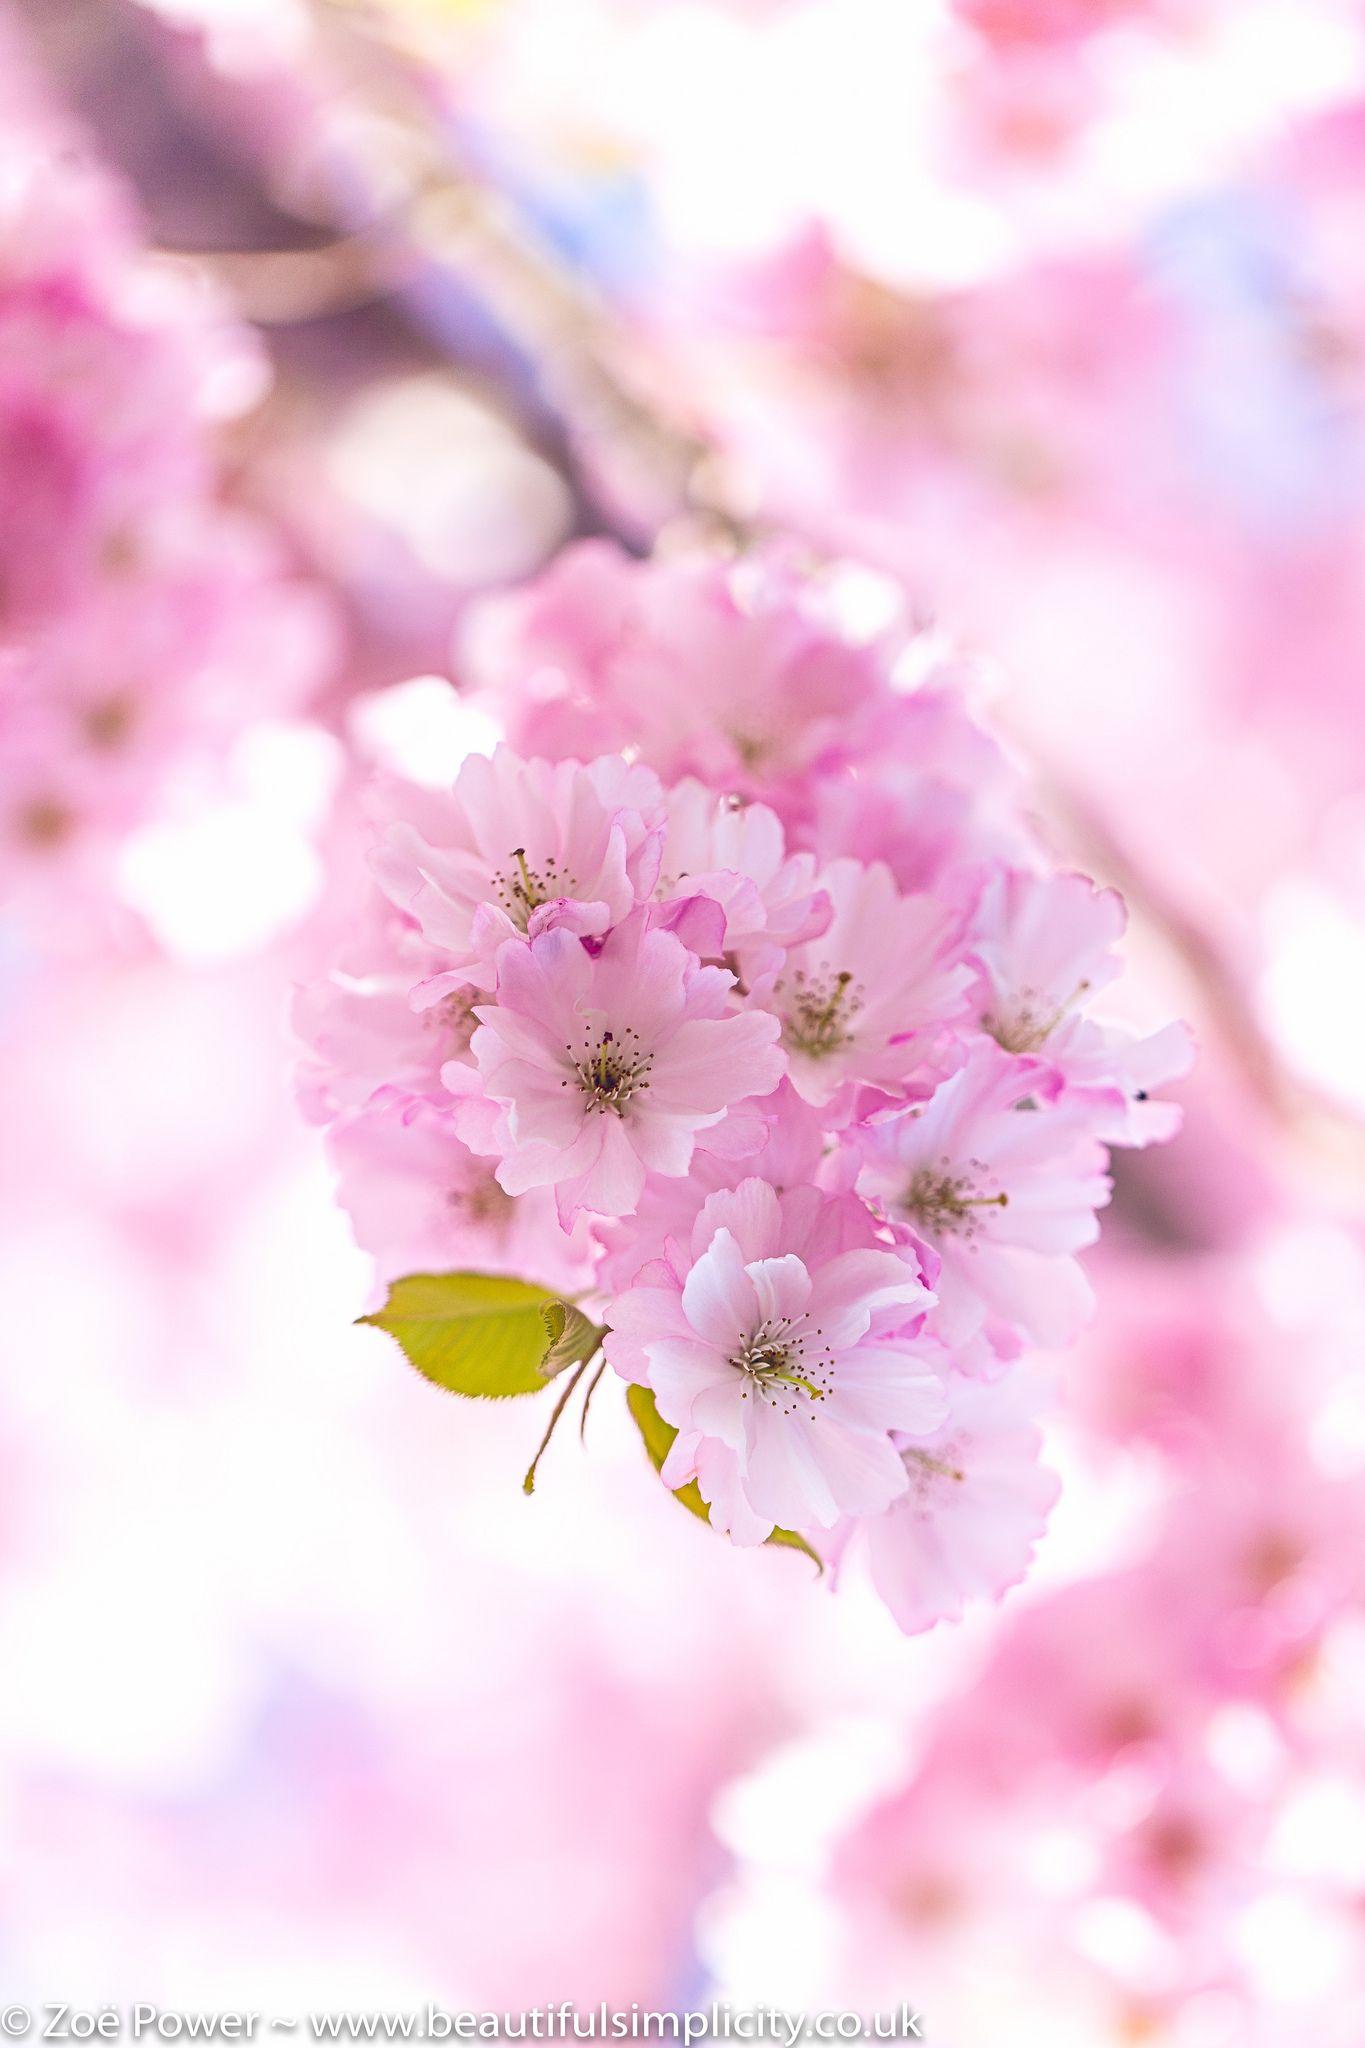 Powder Pink Puffs Of Cherry Blossom Cherry Blossom Tree Beautiful Flowers Wallpapers Sakura Cherry Blossom